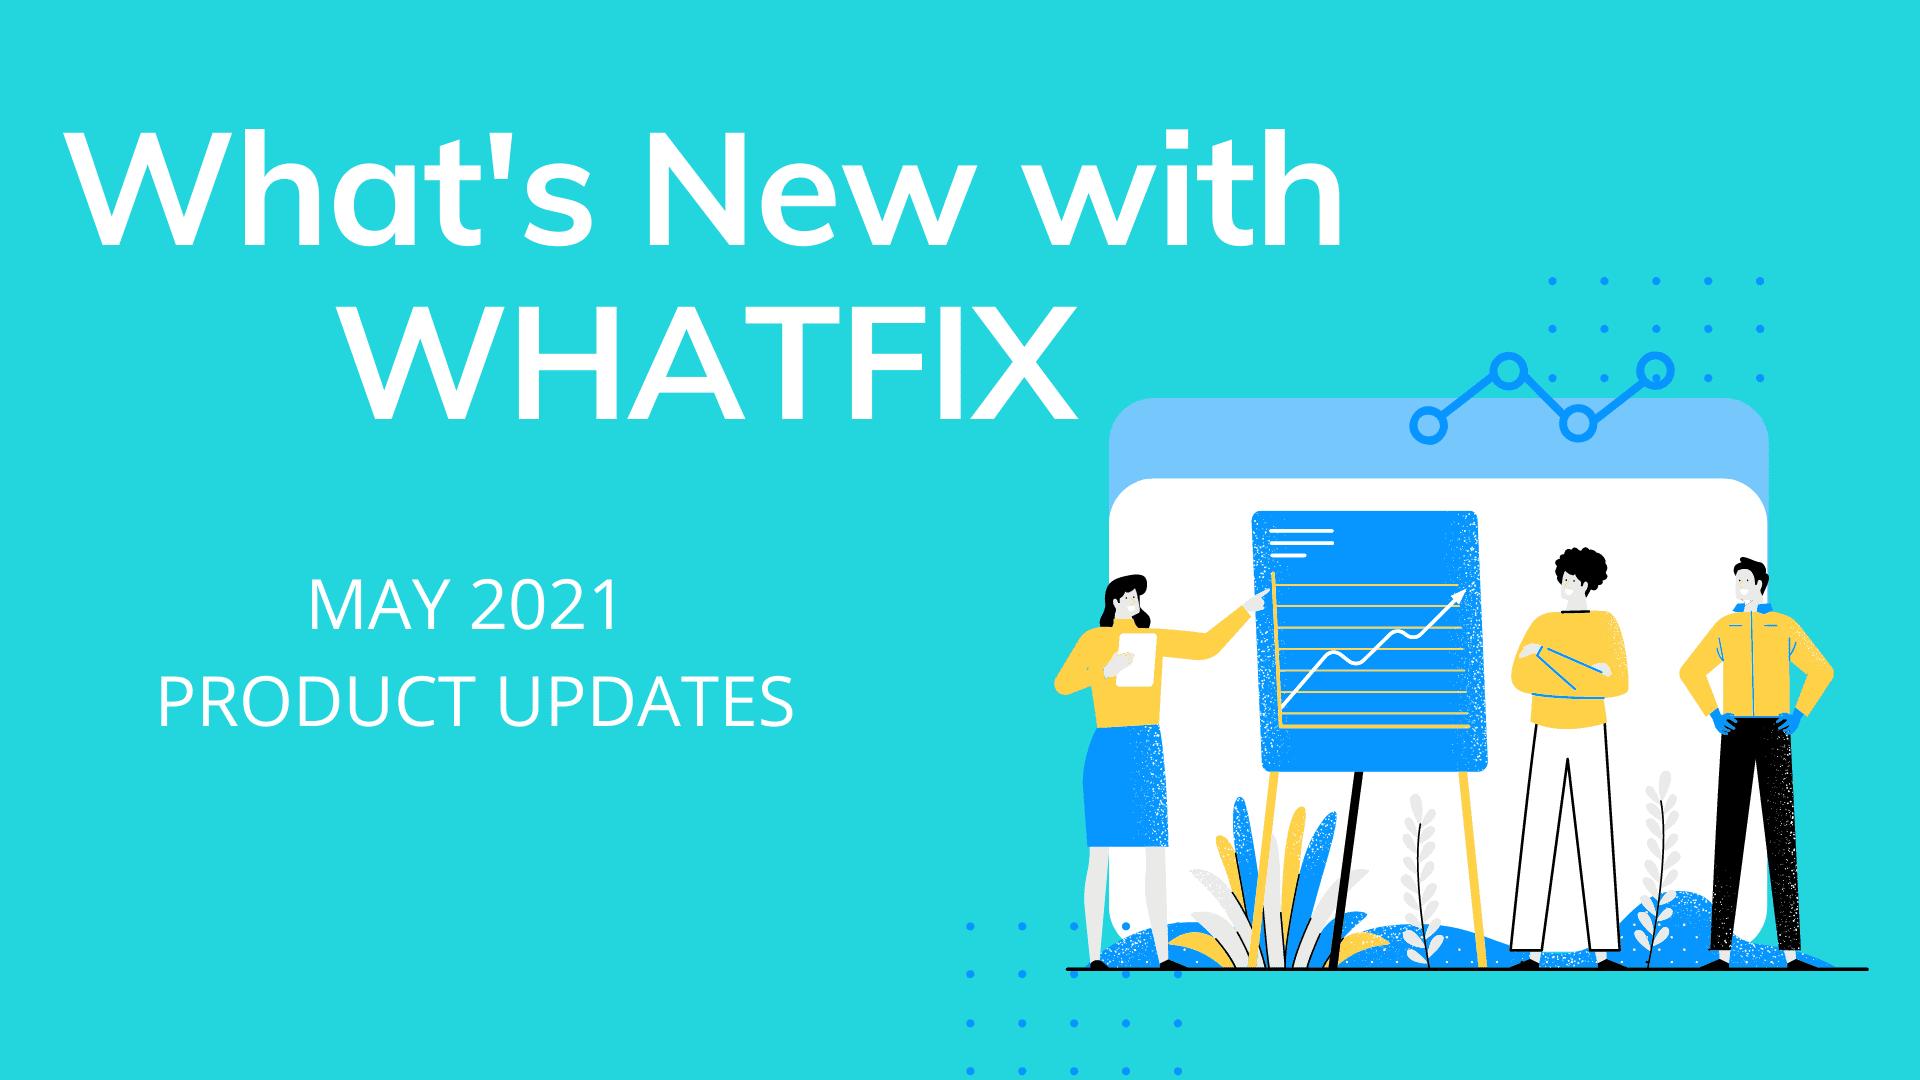 May 2021 Product Updates - The Whatfix Blog | Drive Digital Adoption